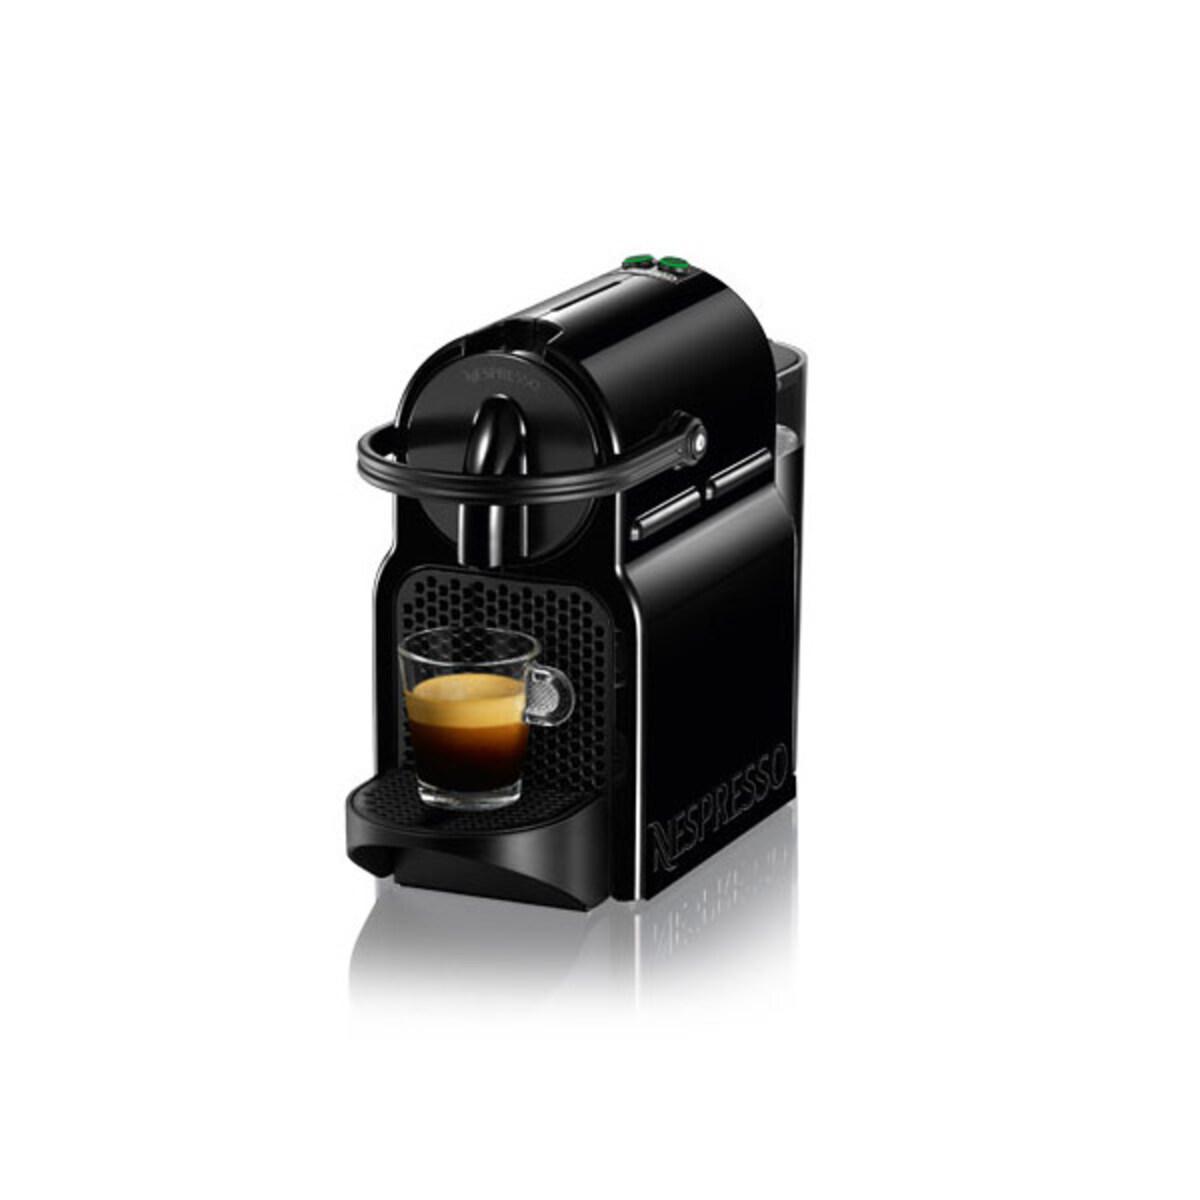 Nespresso Inissia Black + 2 кутии капсули Cafe Royal ПОДАРЪК